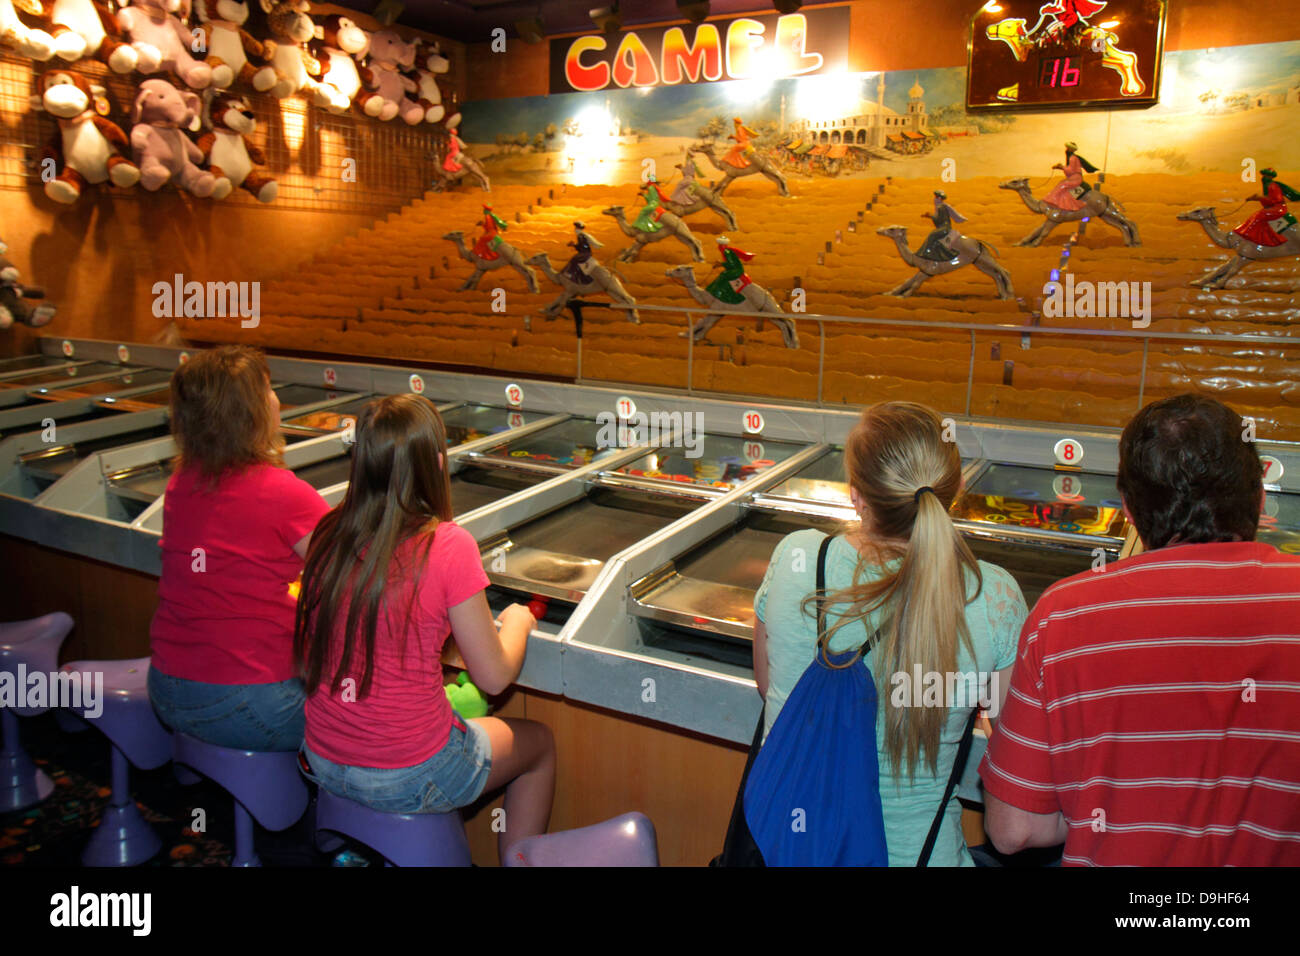 Camel gambling machines in las vegas nevada microgaming online casinos no deposit bonus